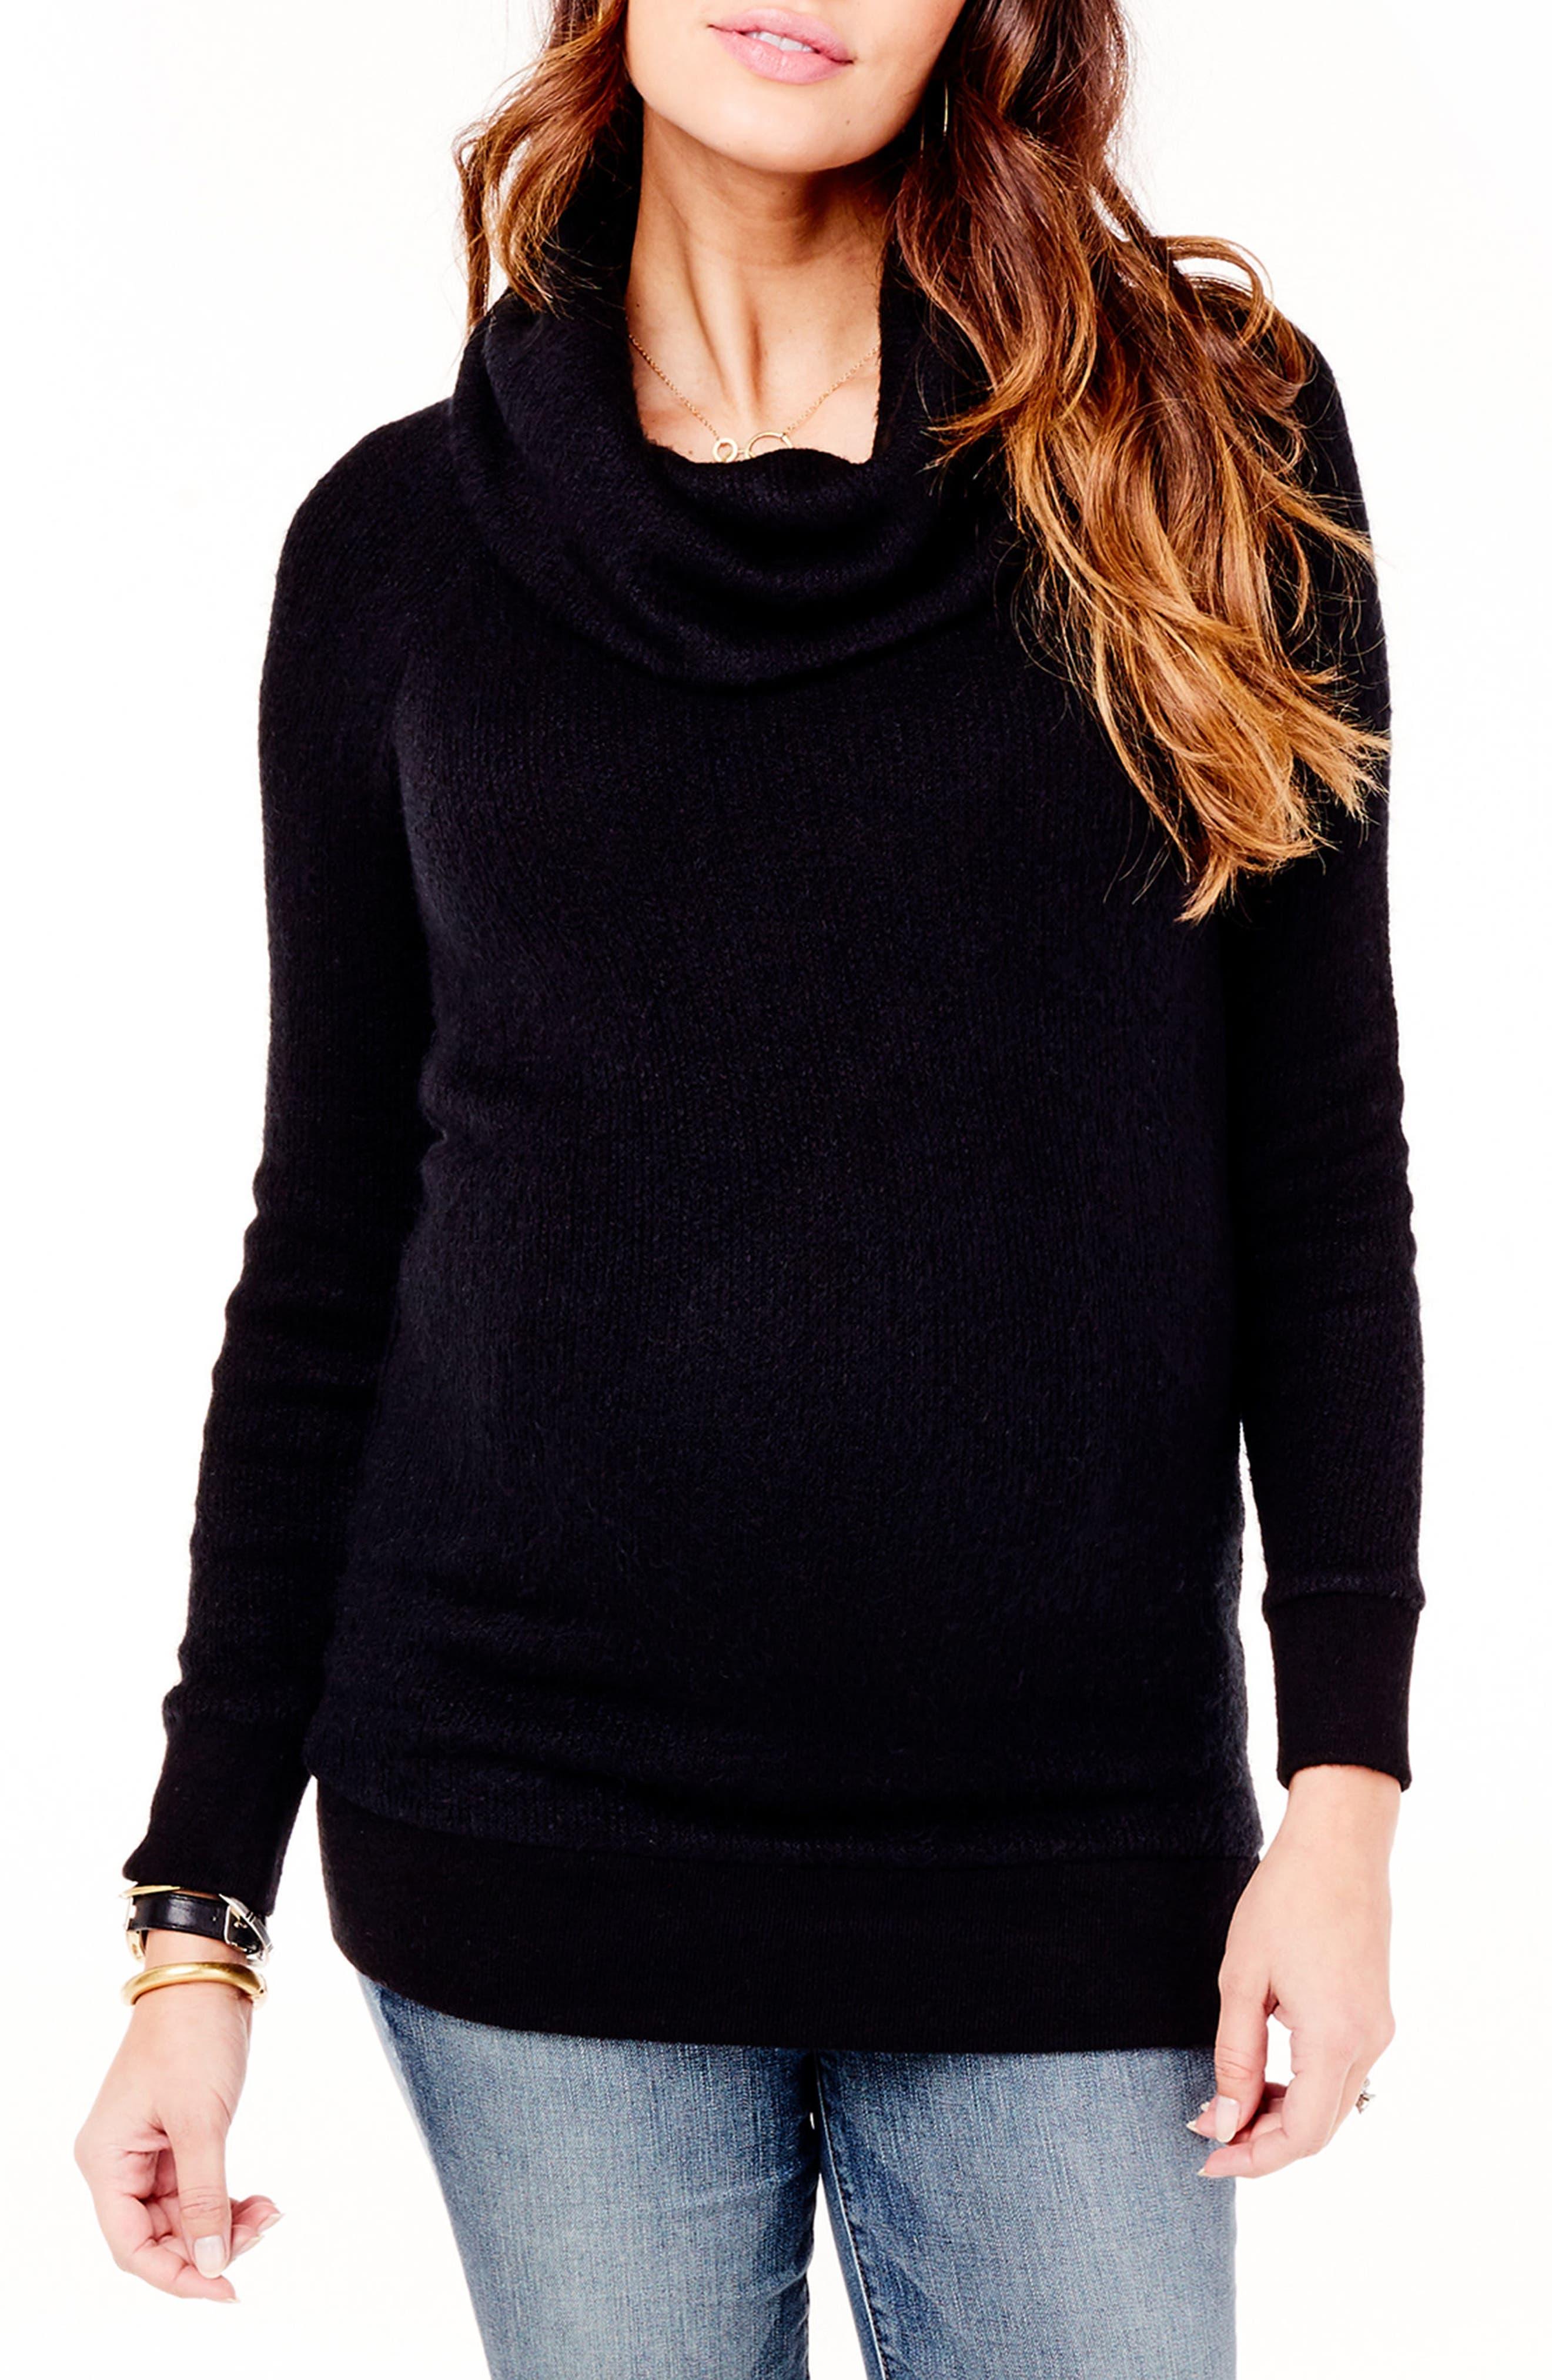 Alternate Image 1 Selected - Ingrid & Isabel® Cowl Neck Maternity Sweater